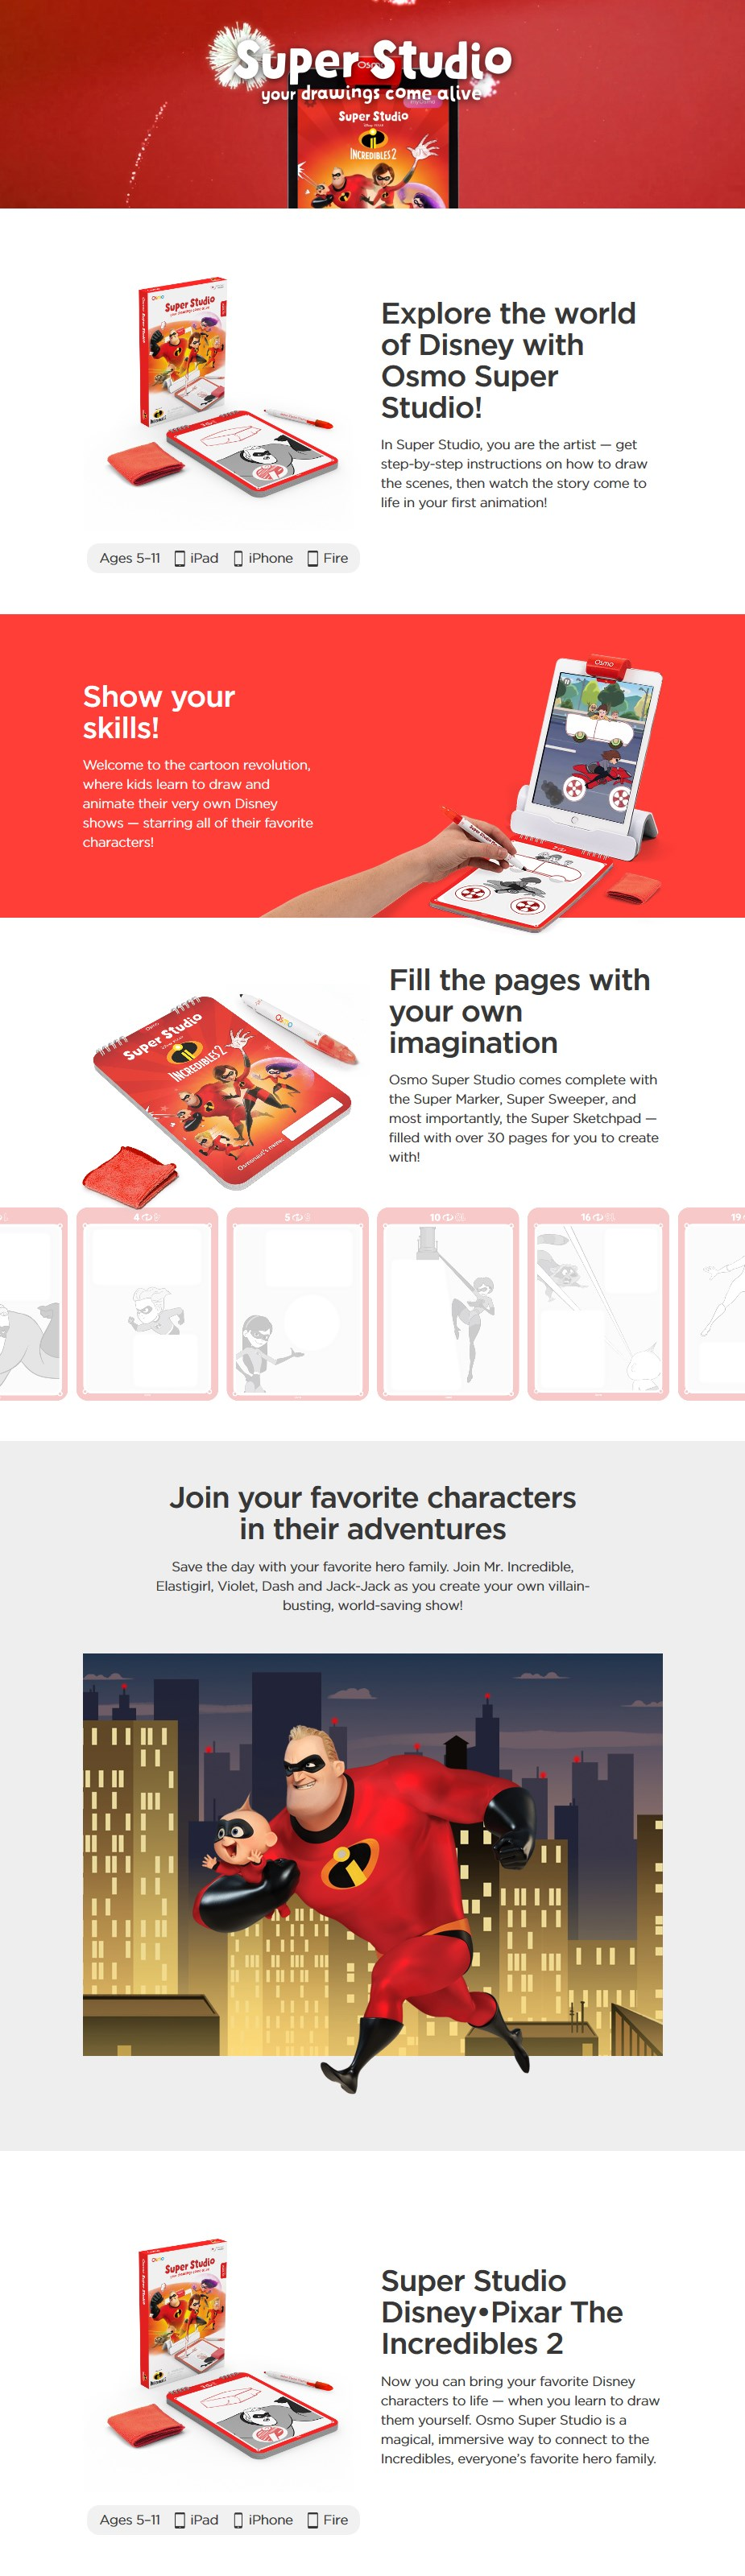 Osmo Super Studio - The Incredibles 2 for iPad - Desktop Overview 1